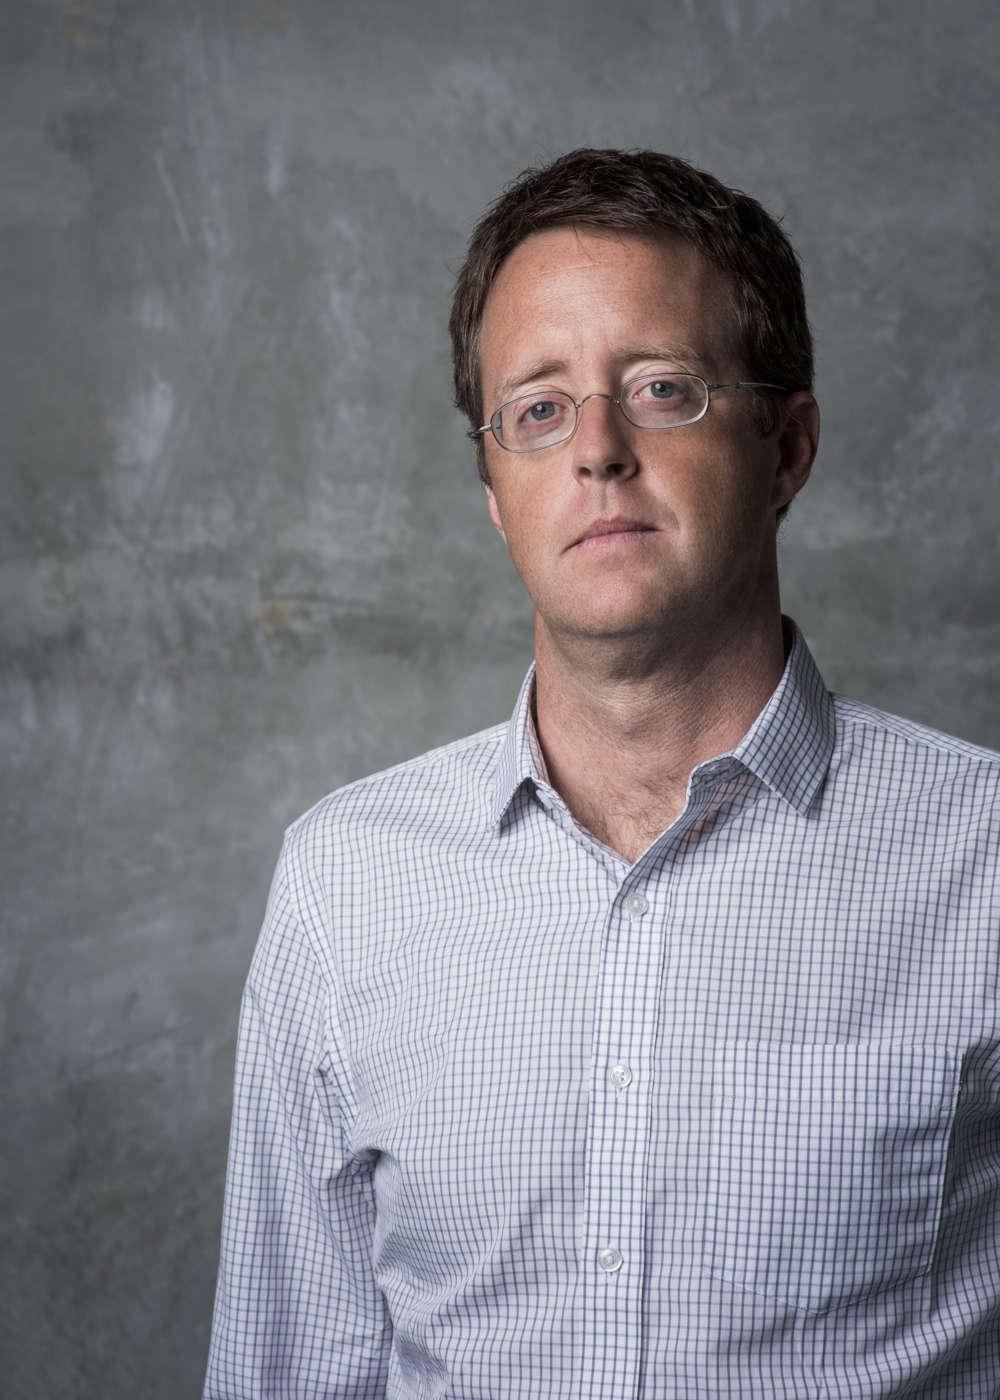 Todd Gannon Faculty Portraits 020 S2